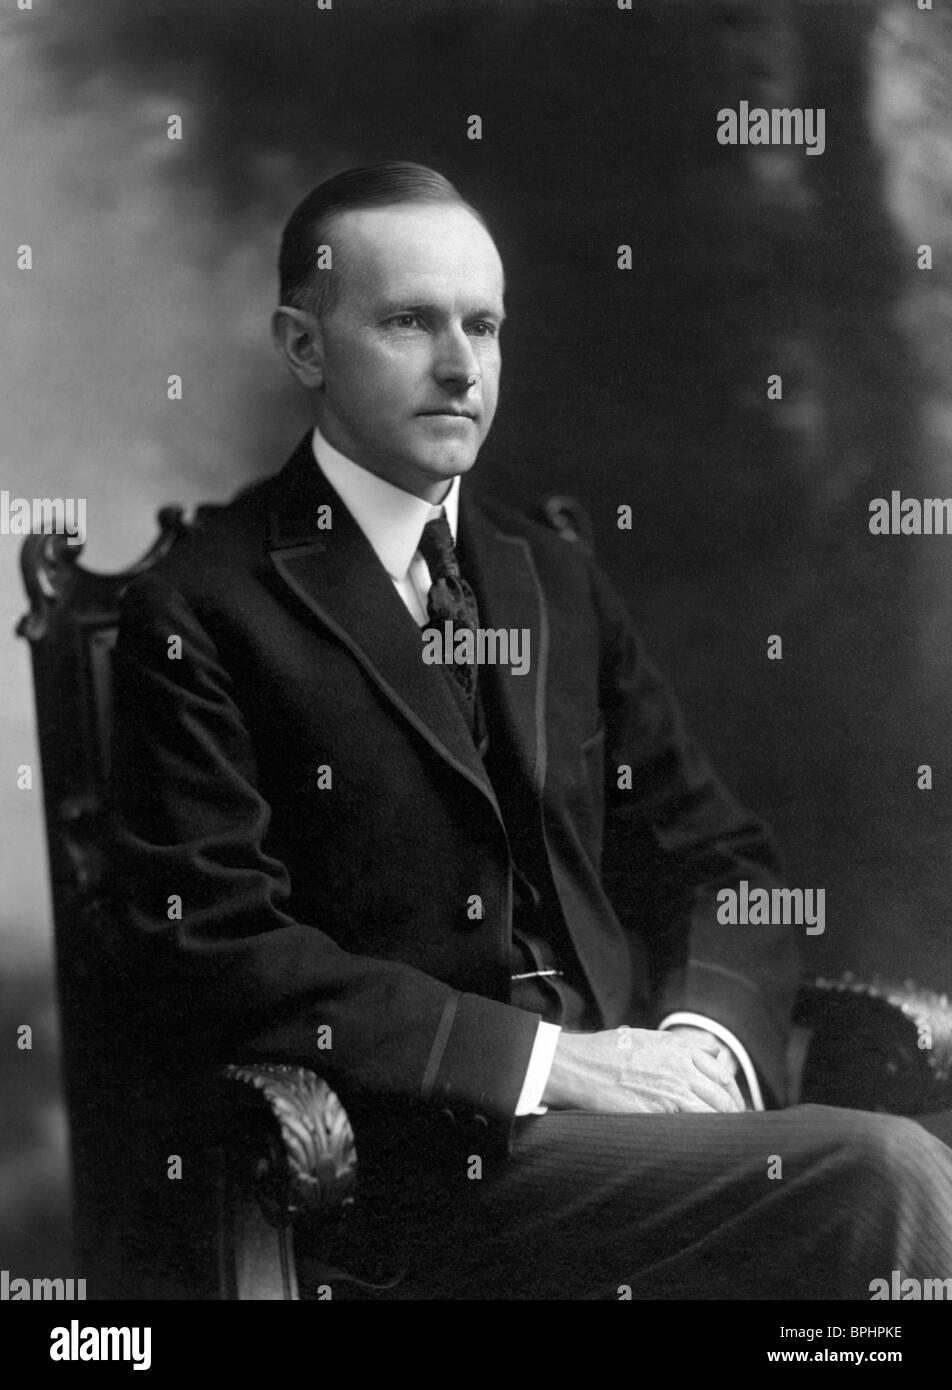 Portrait photo circa 1919 of Calvin Coolidge (1872 - 1933) - the 30th US President (1923 - 1929). Stock Photo